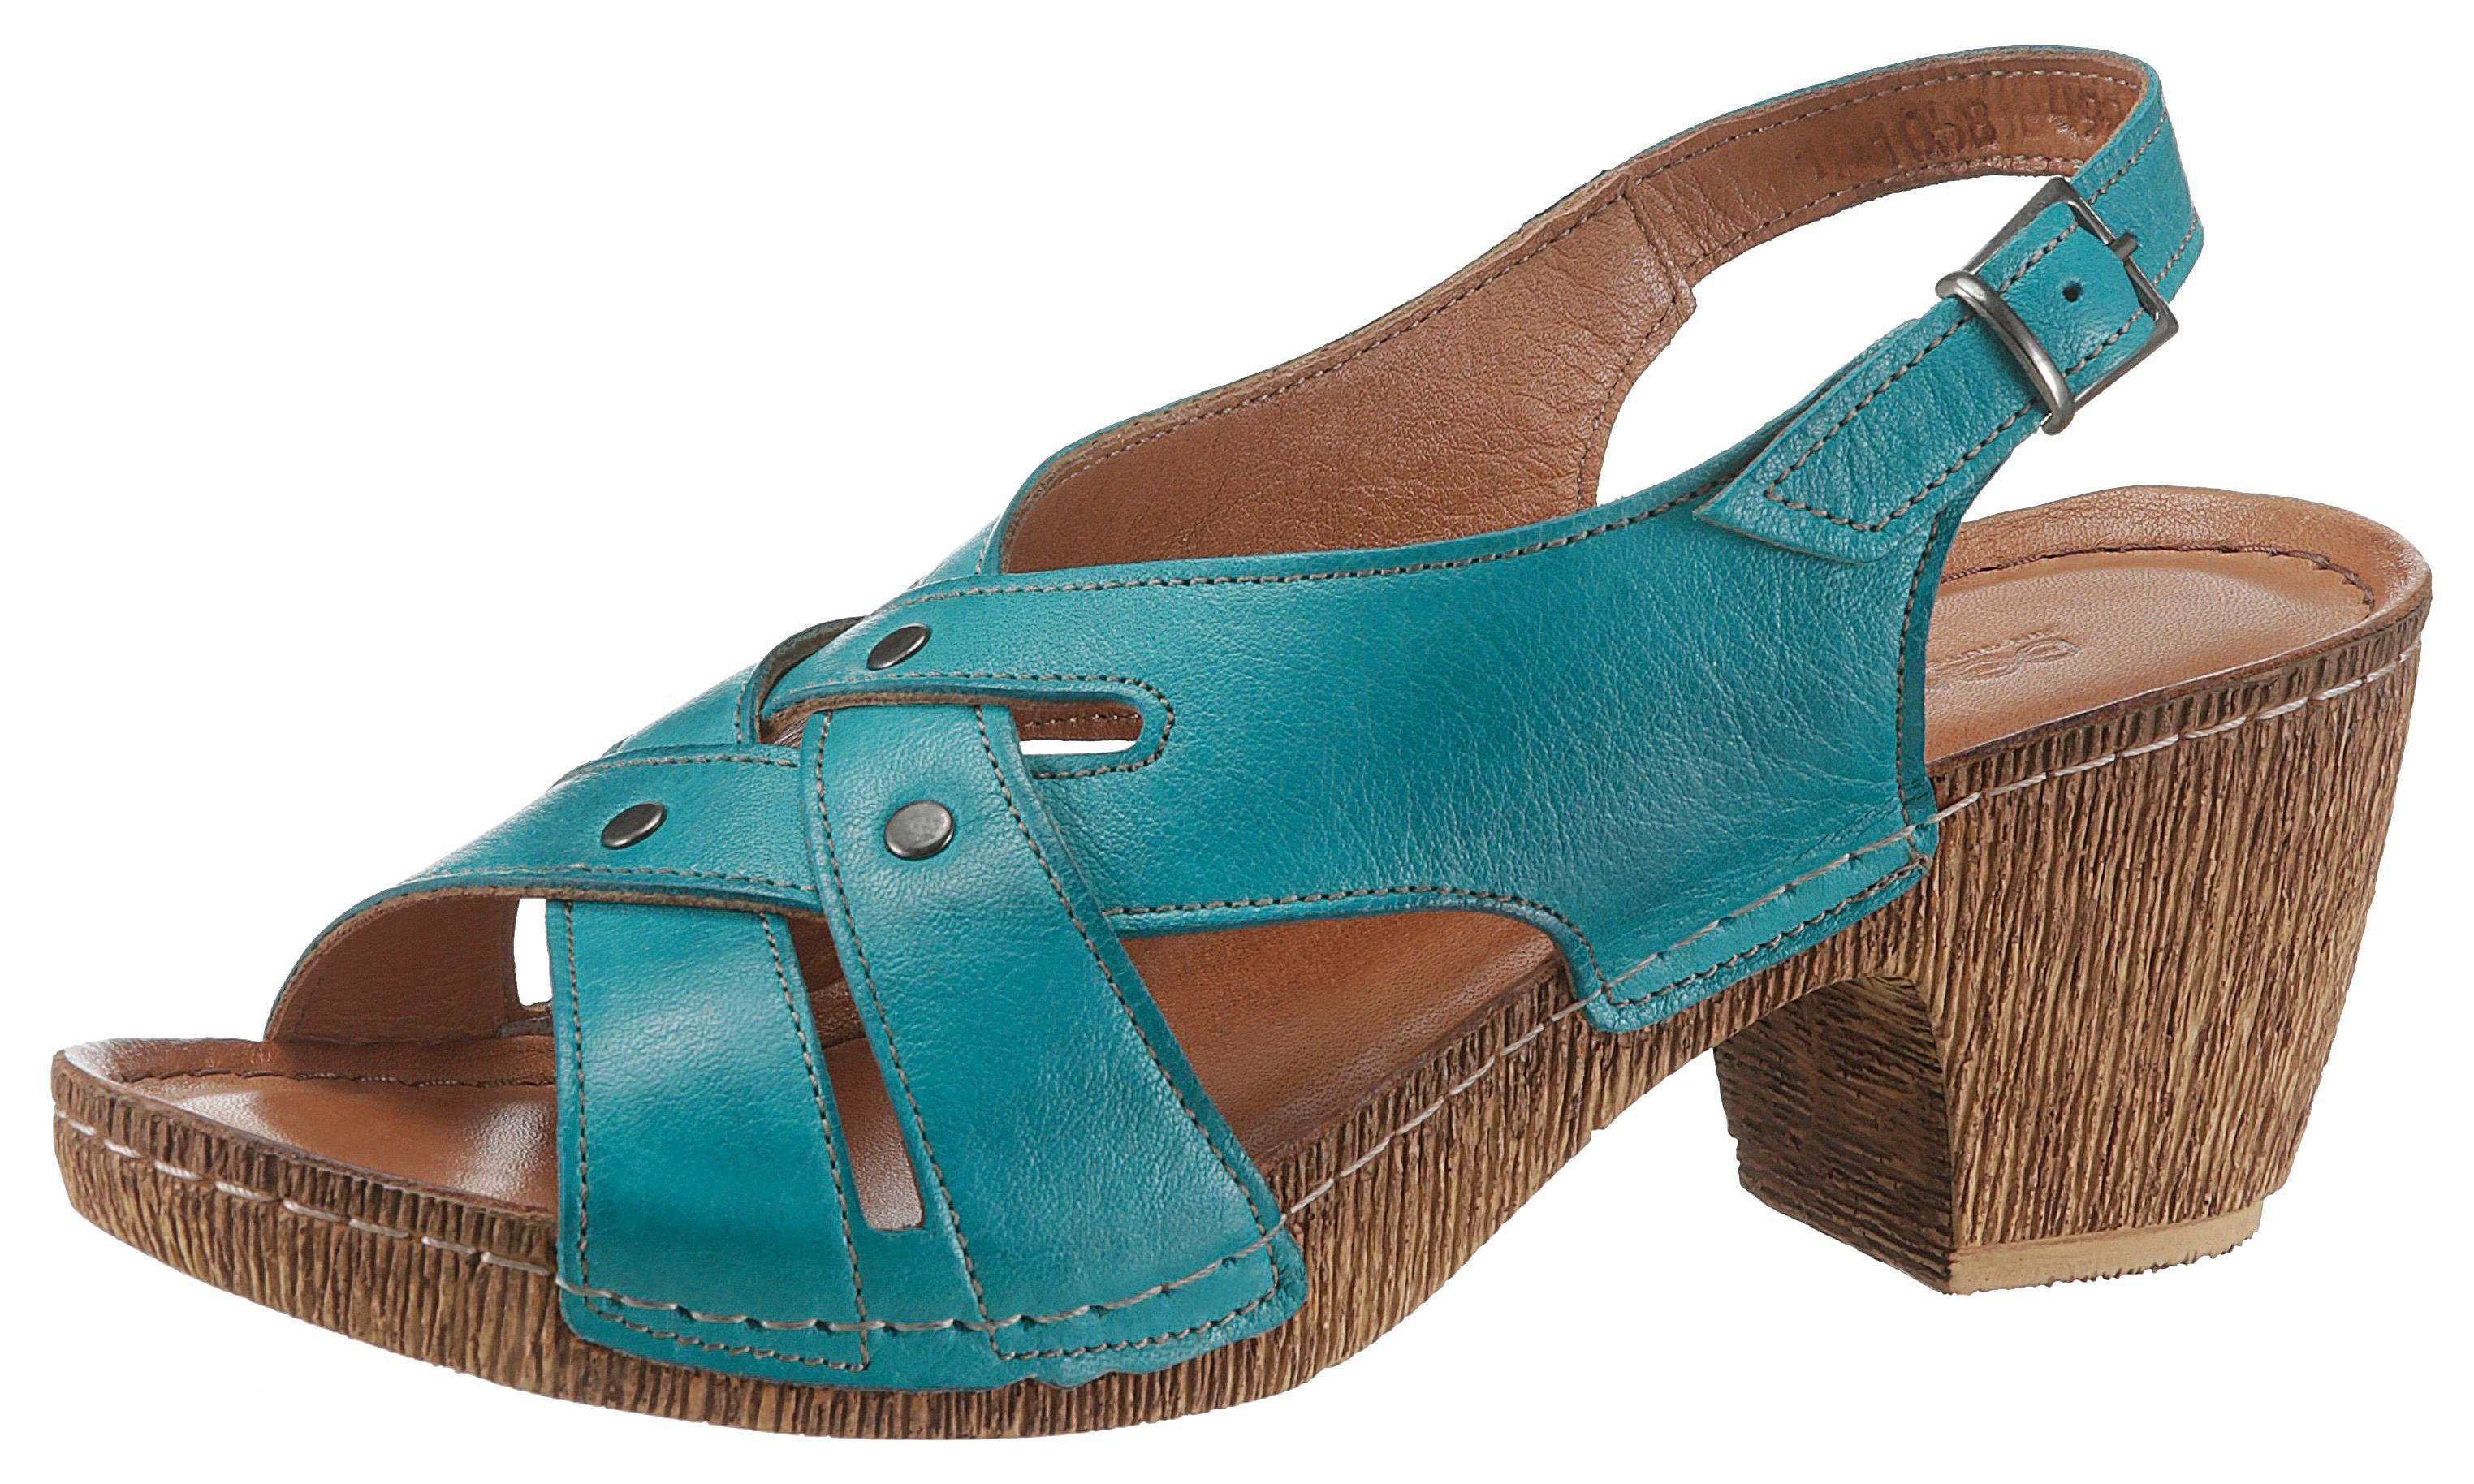 Gemini Sandalette mit verstellbarer Schnalle